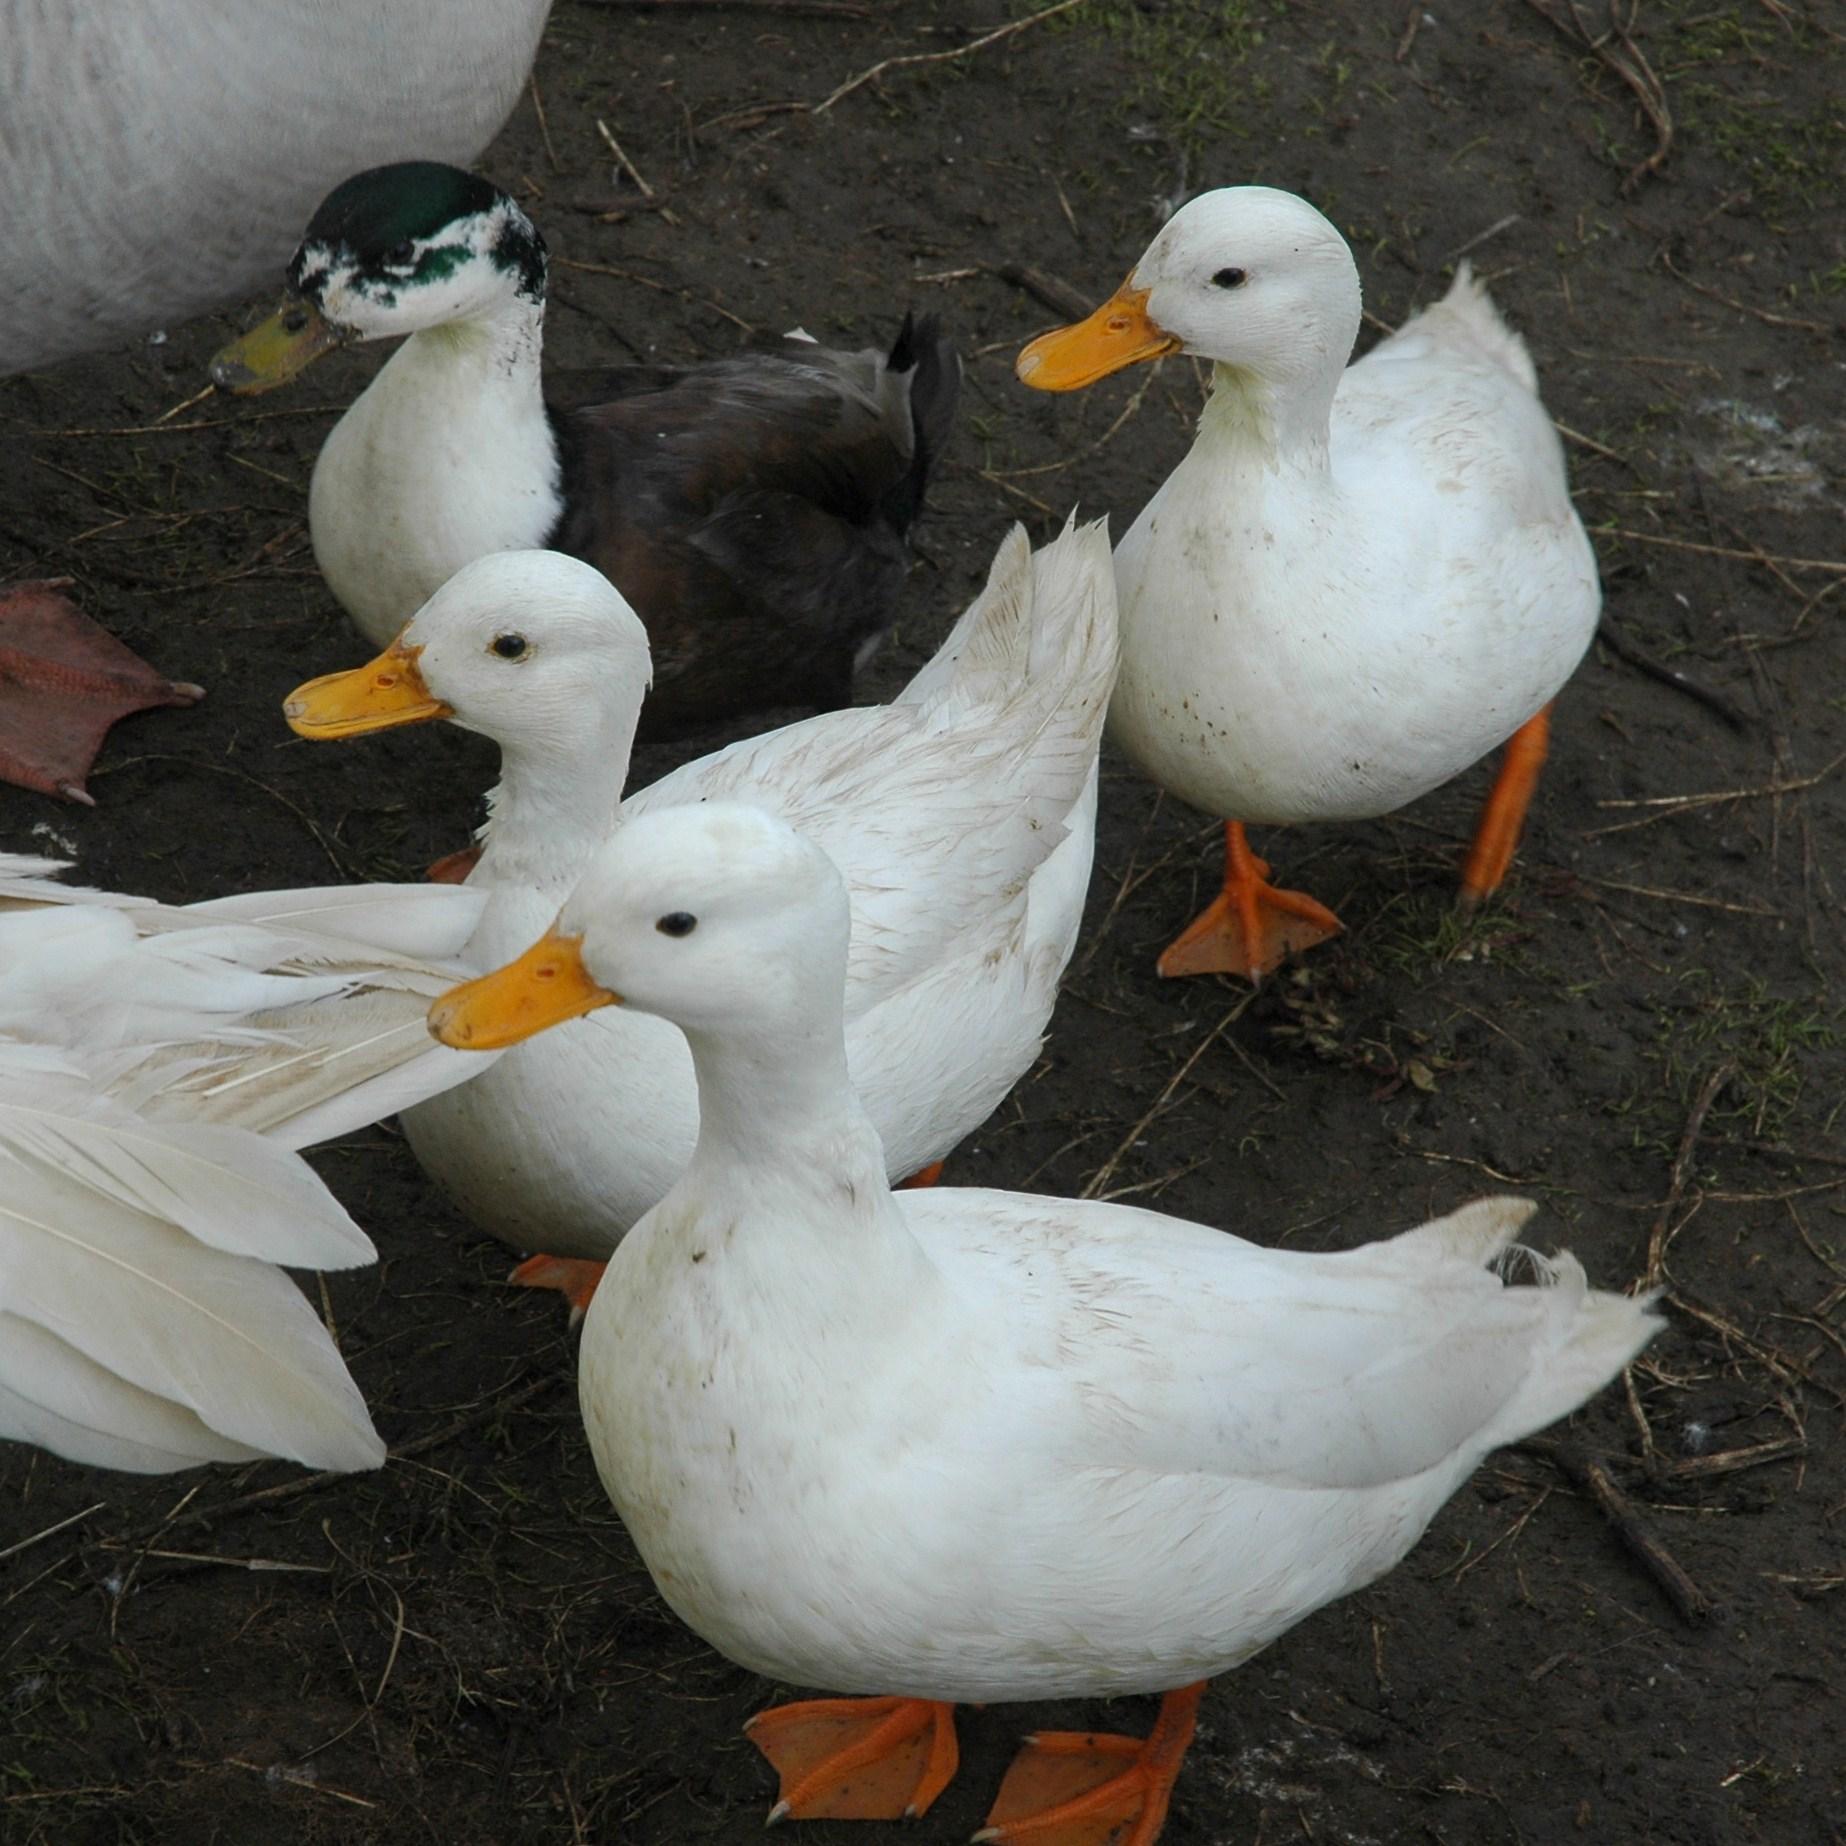 Bird flu hits duck farm in Bulgaria's Yambol